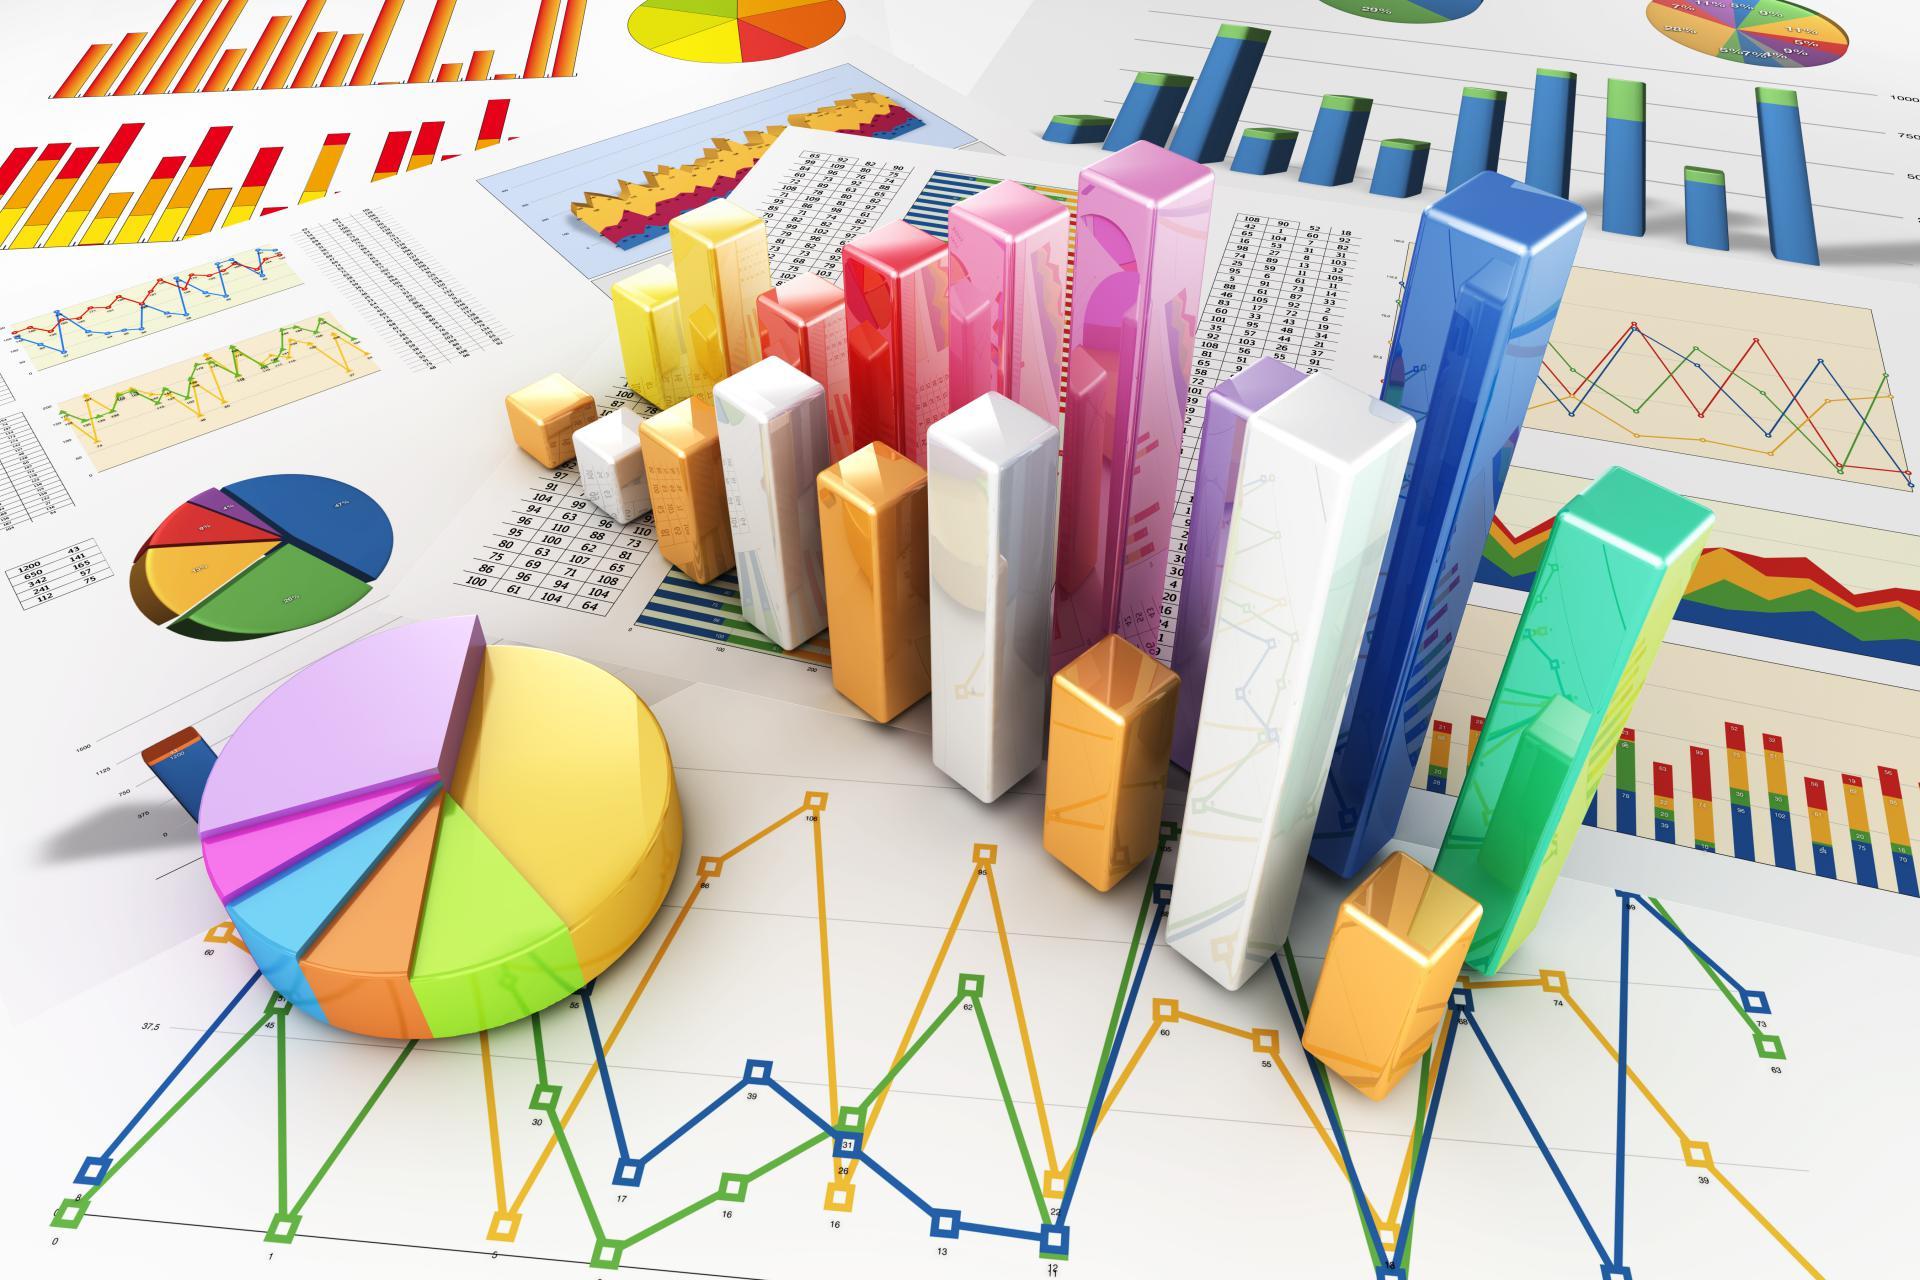 картинки экономическую тематику